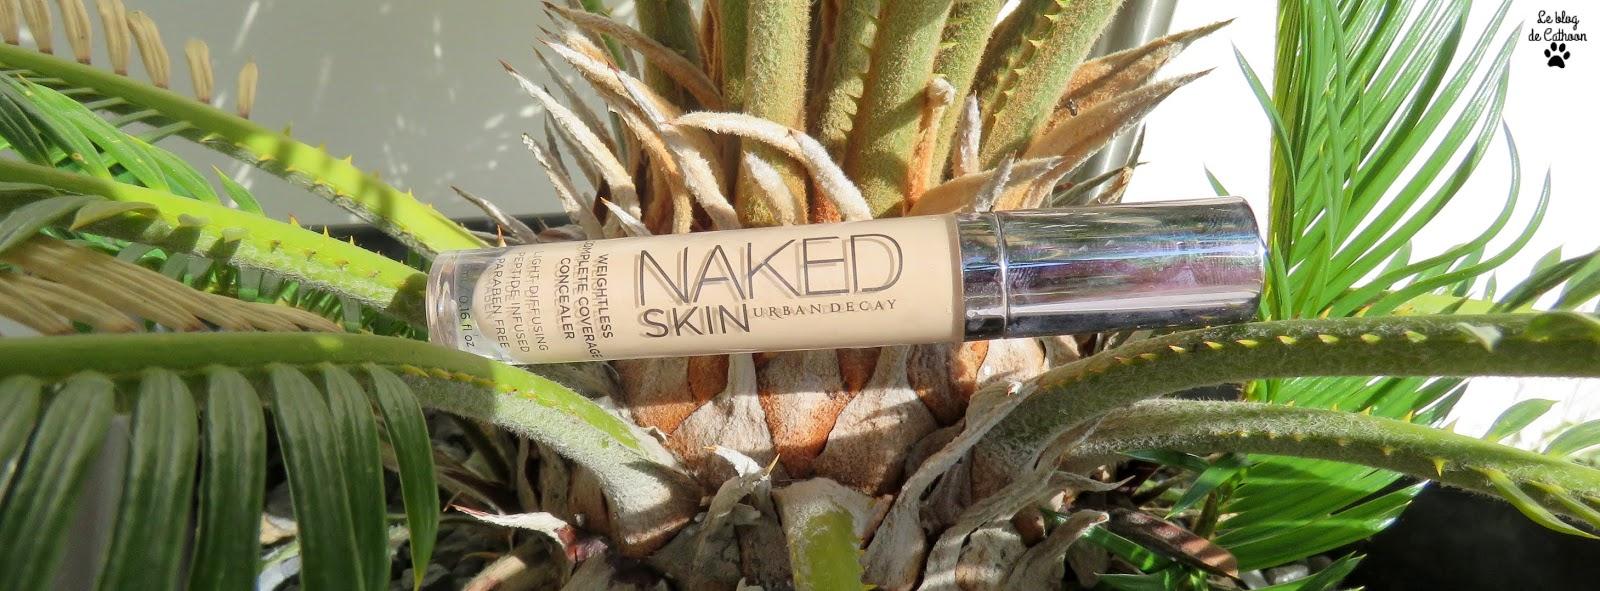 Naked Skin - Correcteur - Urban Decay